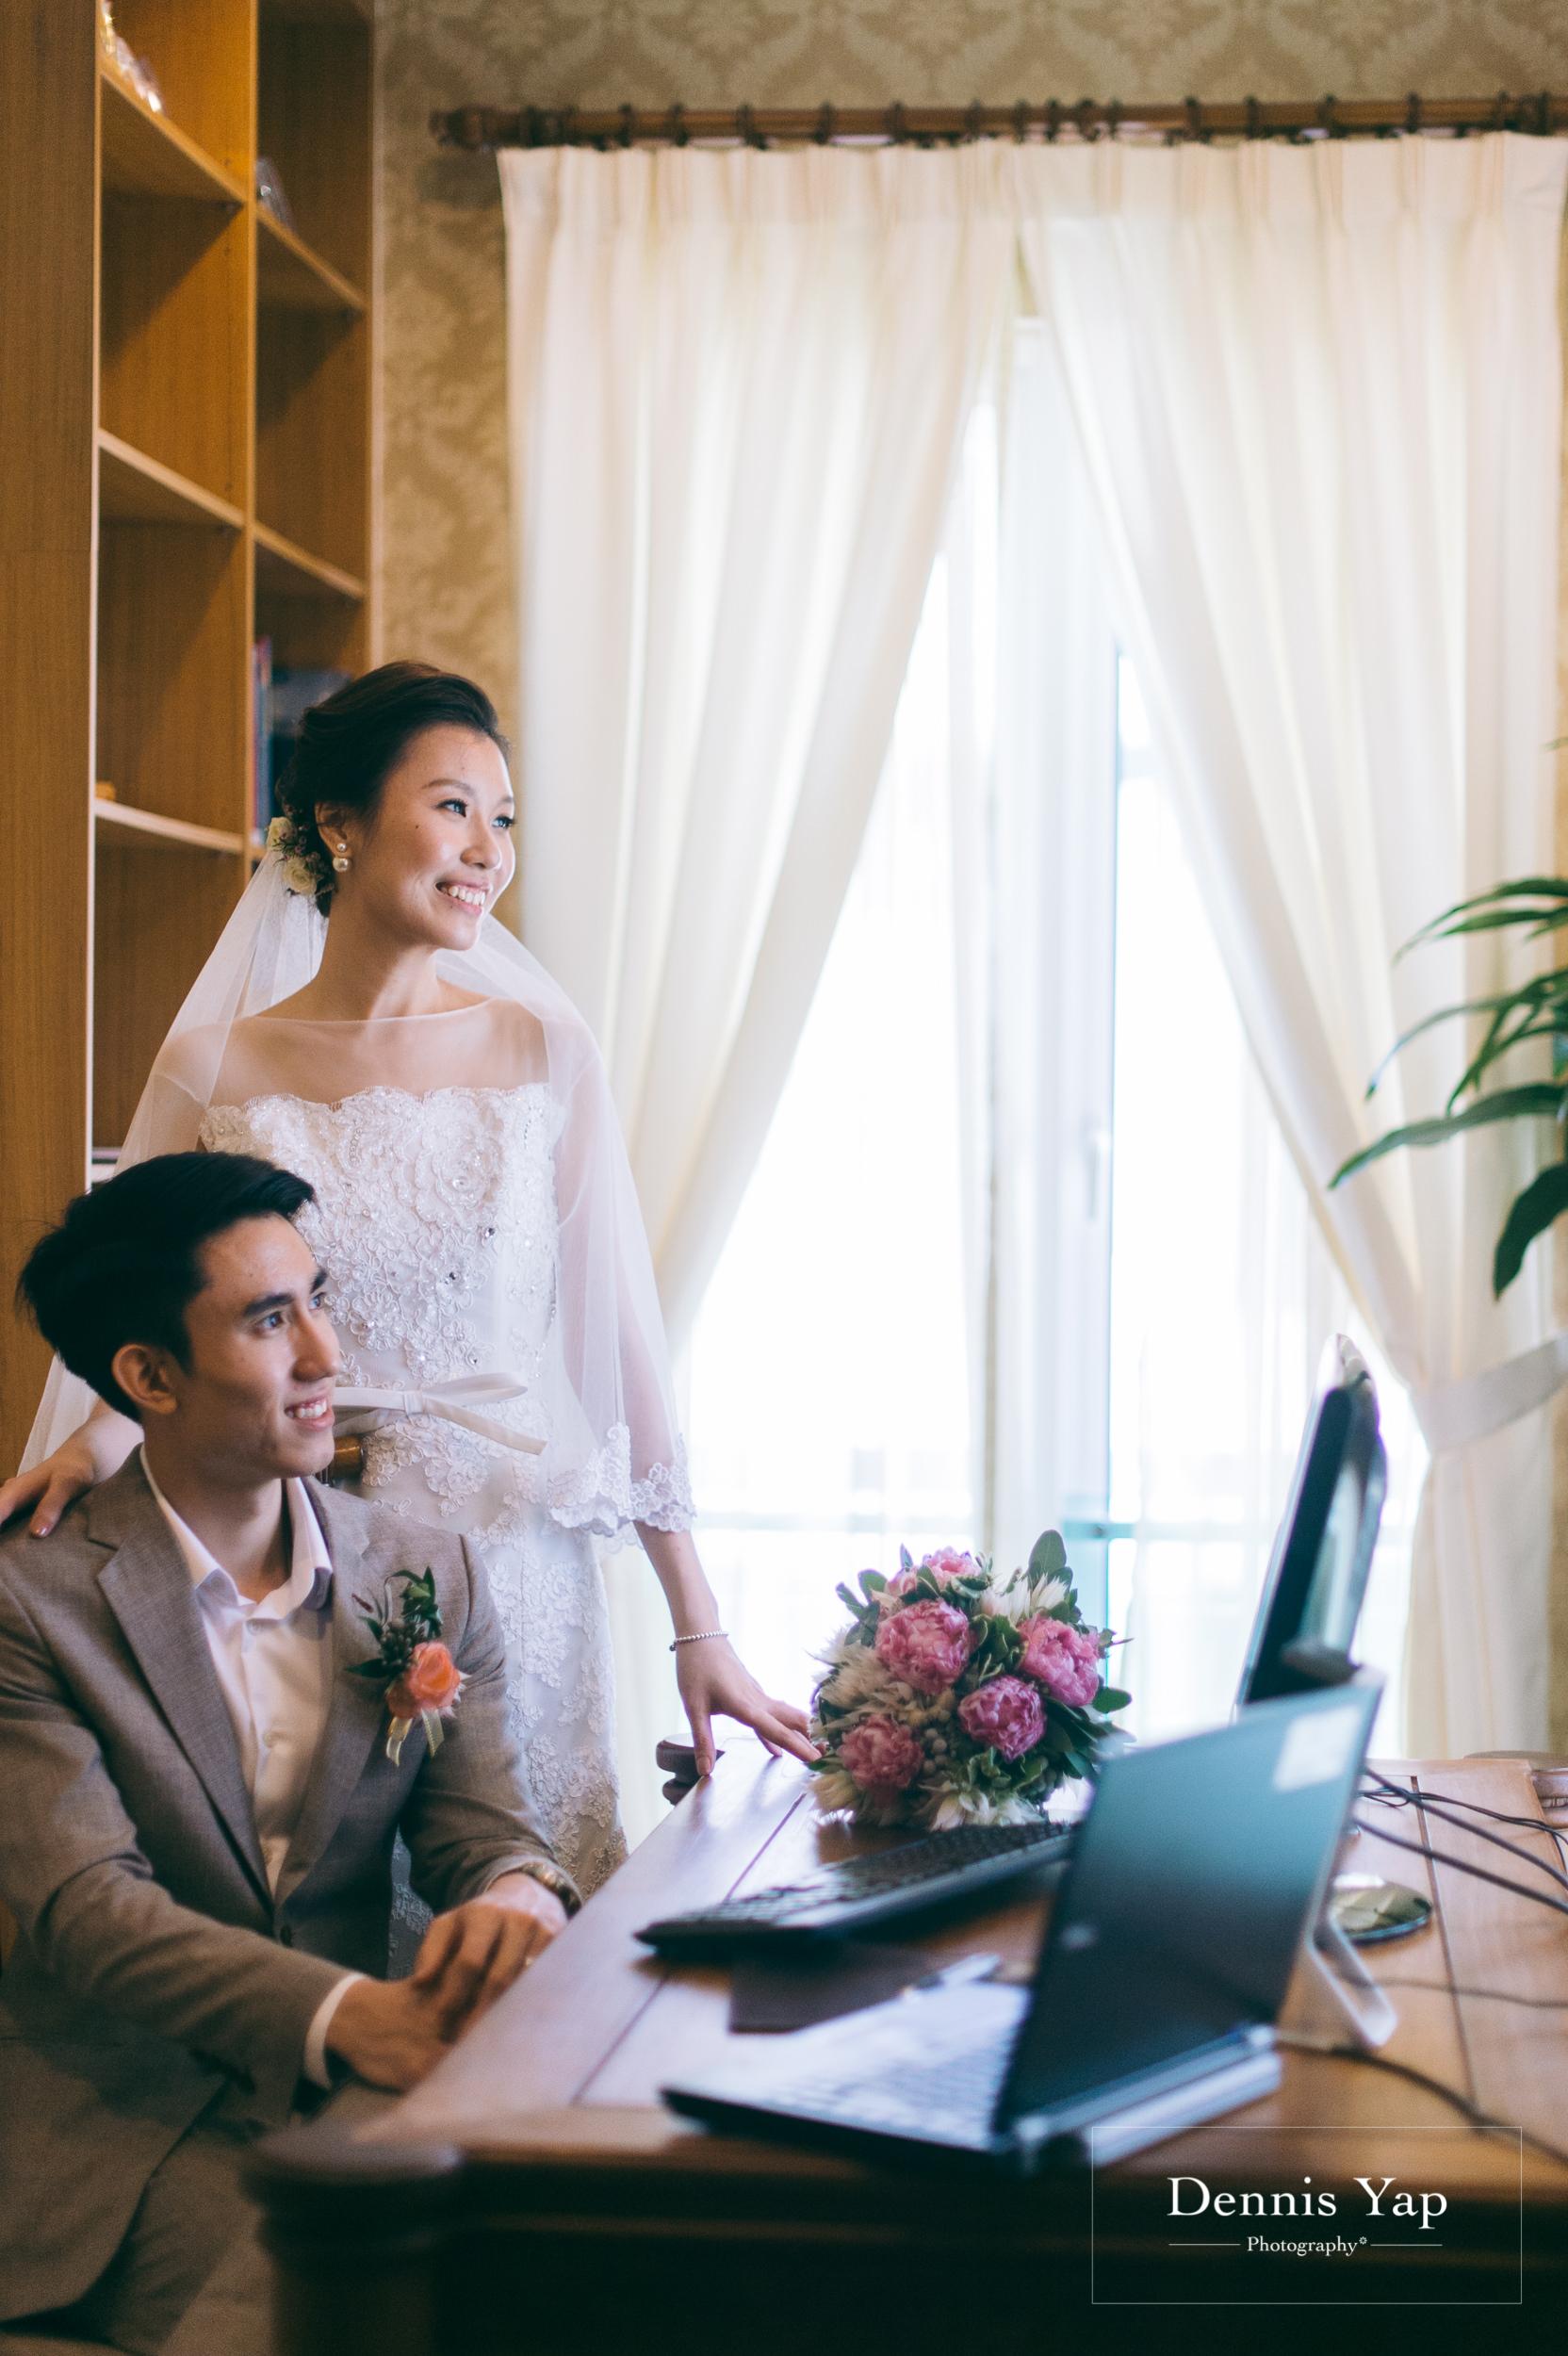 danny sherine wedding day group photo dennis yap photography usj heights malaysia top wedding photographer-16.jpg